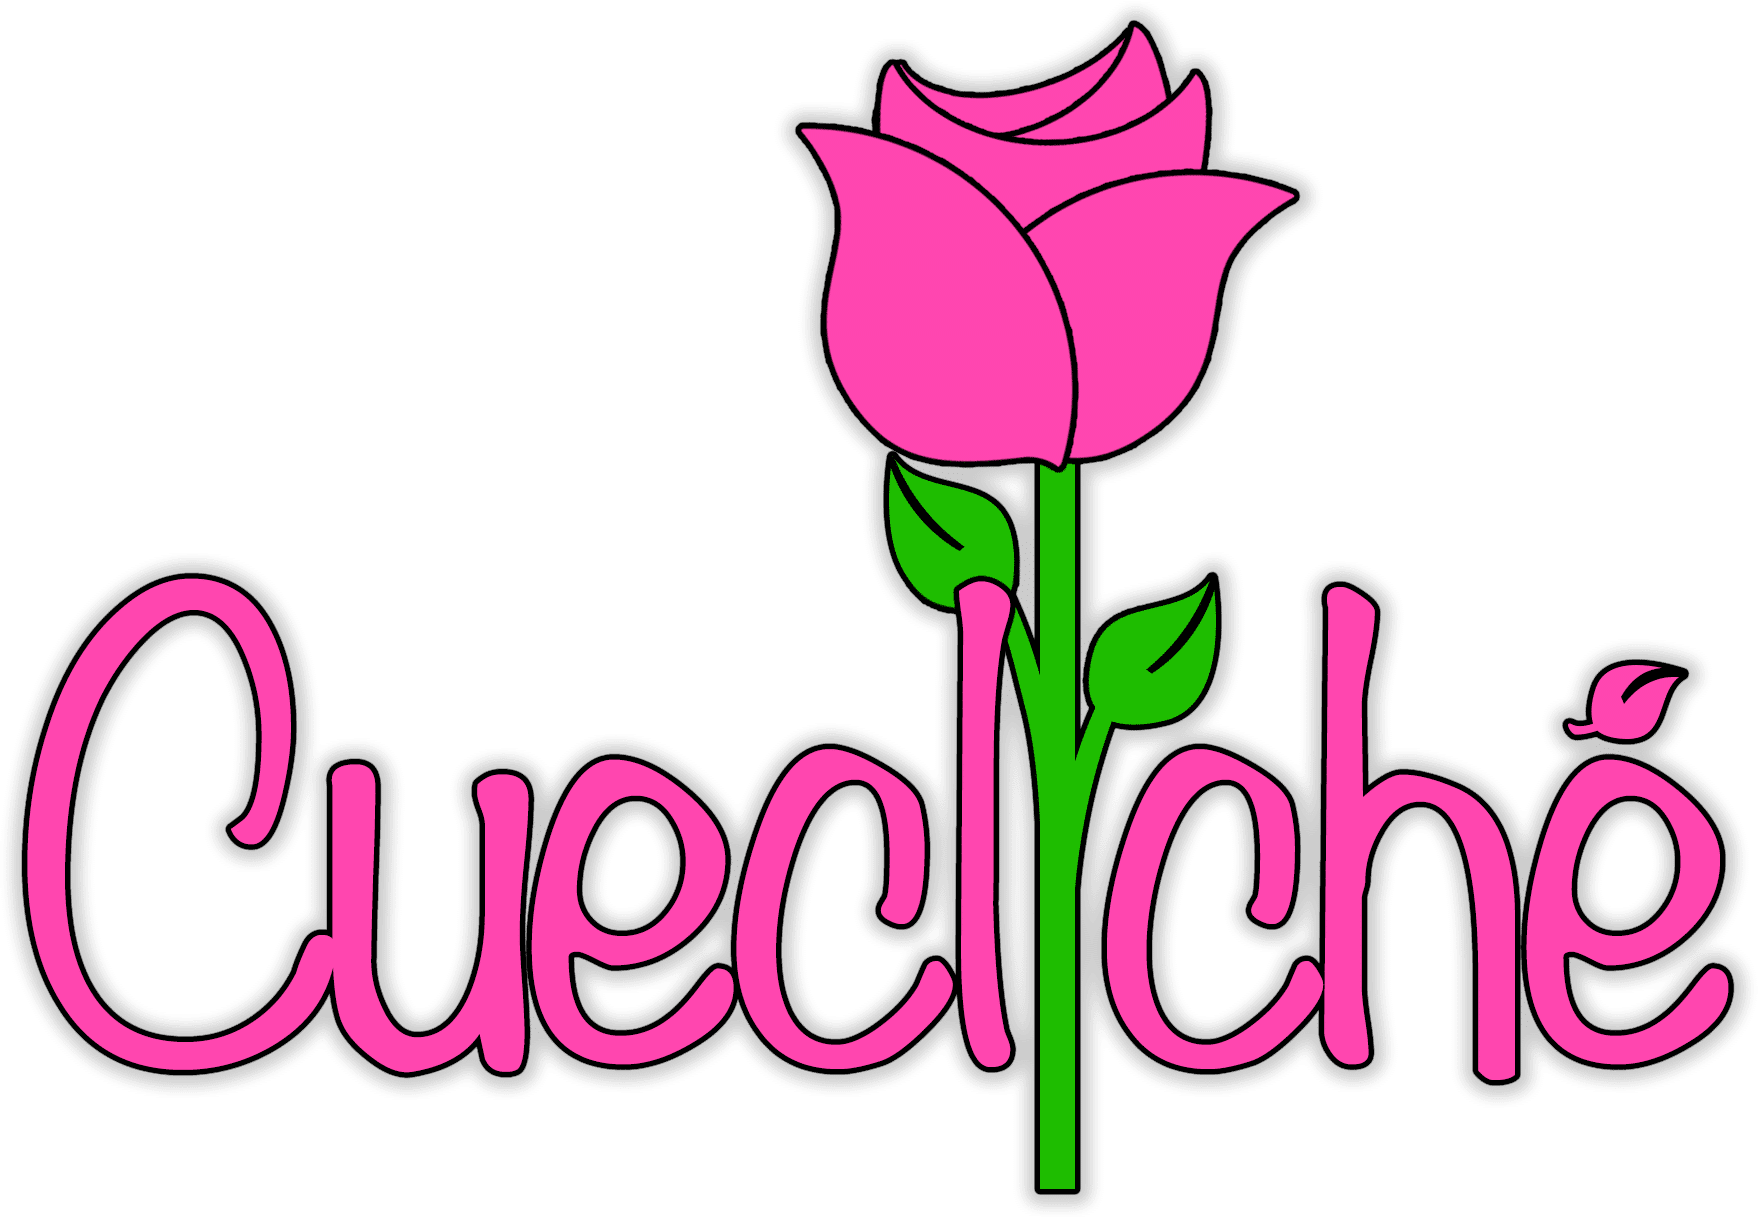 Cuecliche | Official Website